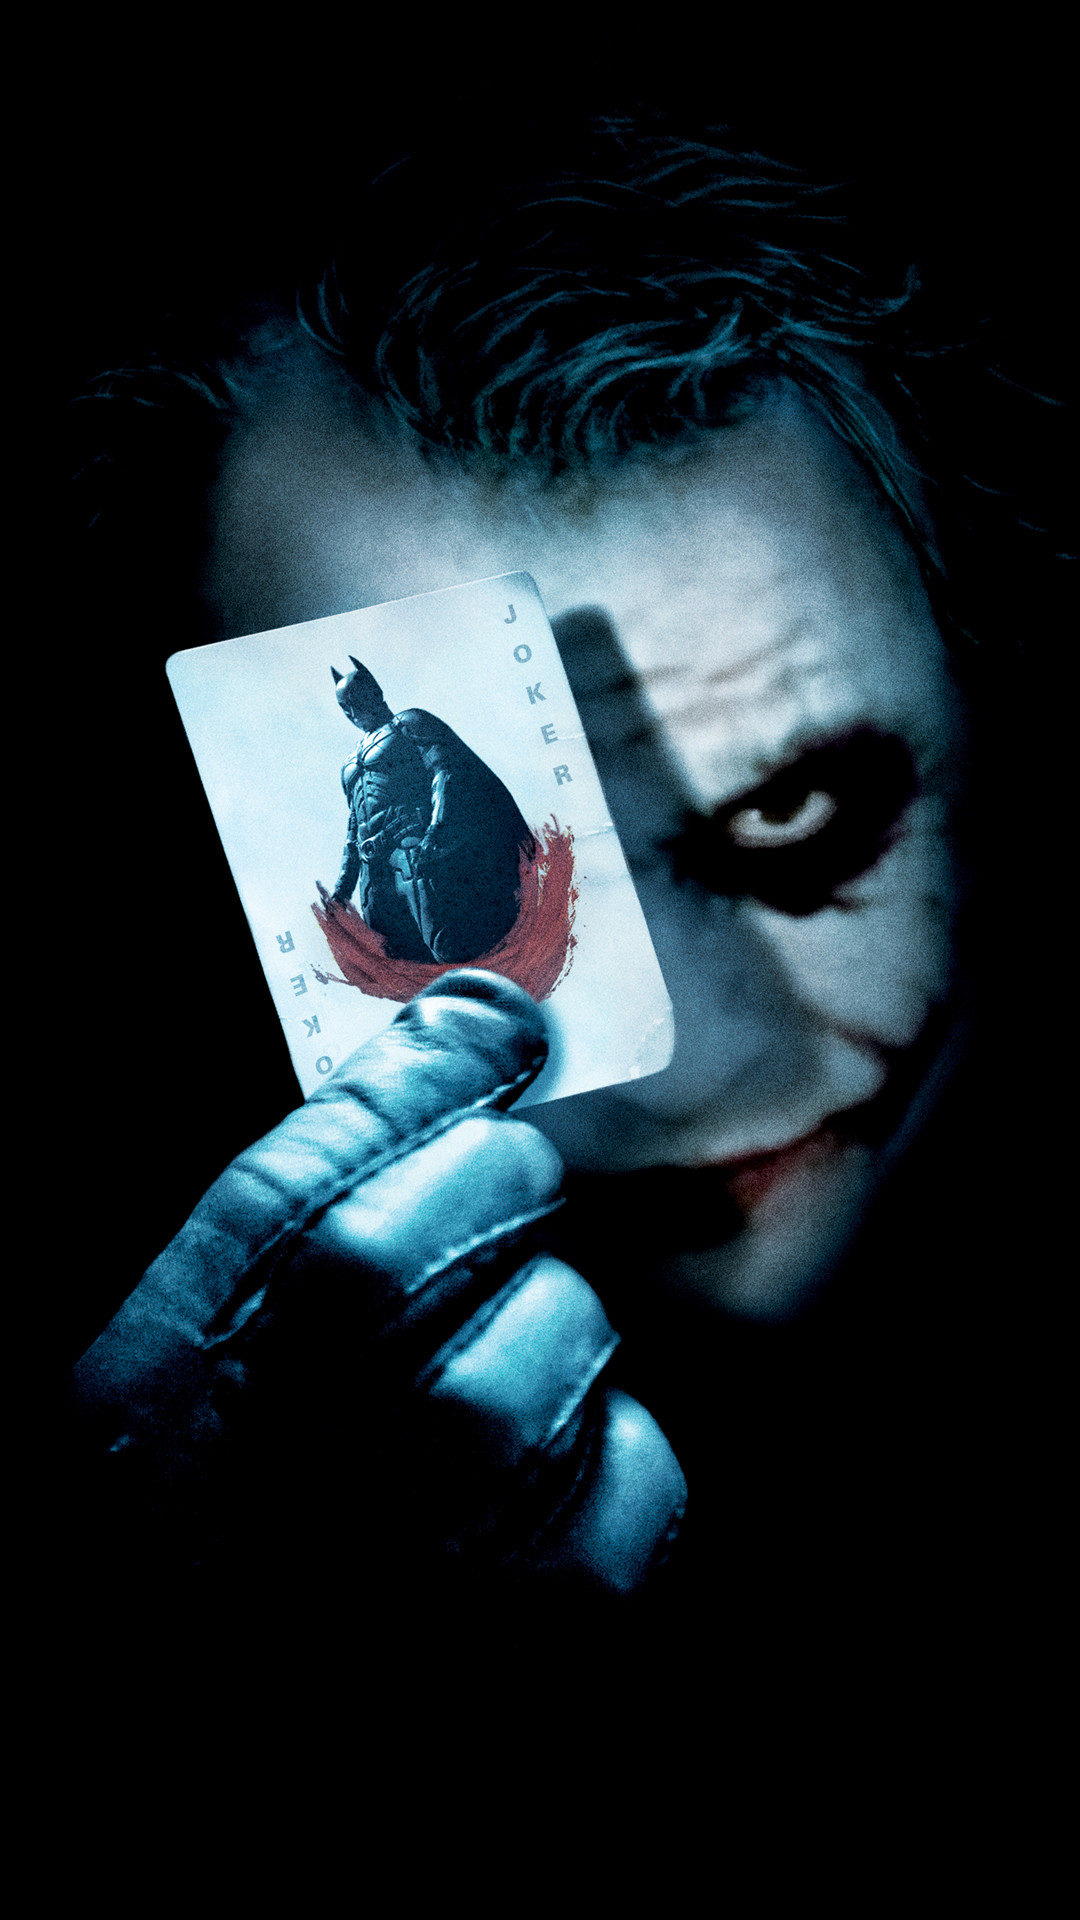 23 Awesome Hd Cool Joker Scary Wallpapers On Wallpapersafari